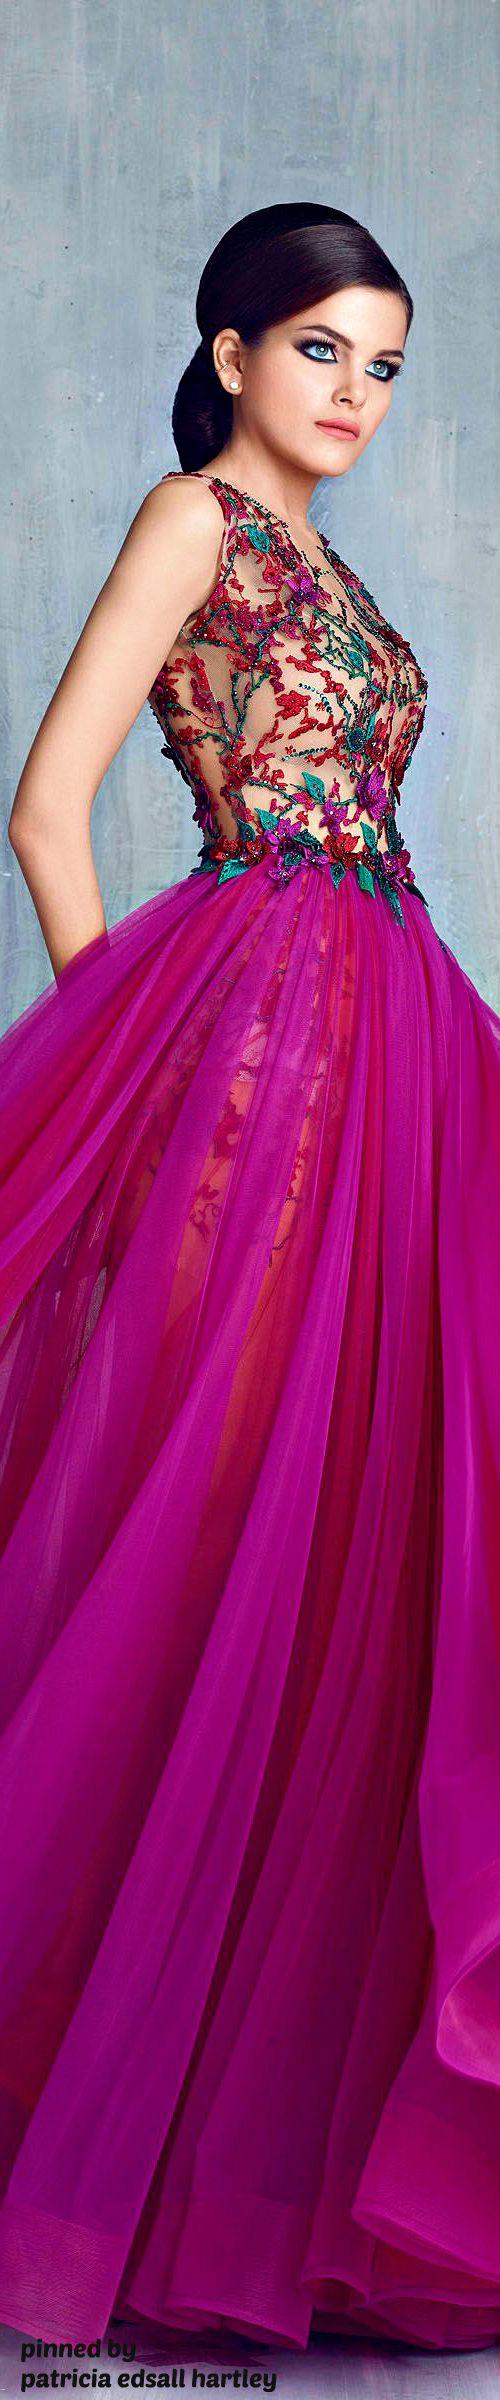 Tony Chaaya SS 2016 Couture | Moda vestir elegante | Pinterest ...